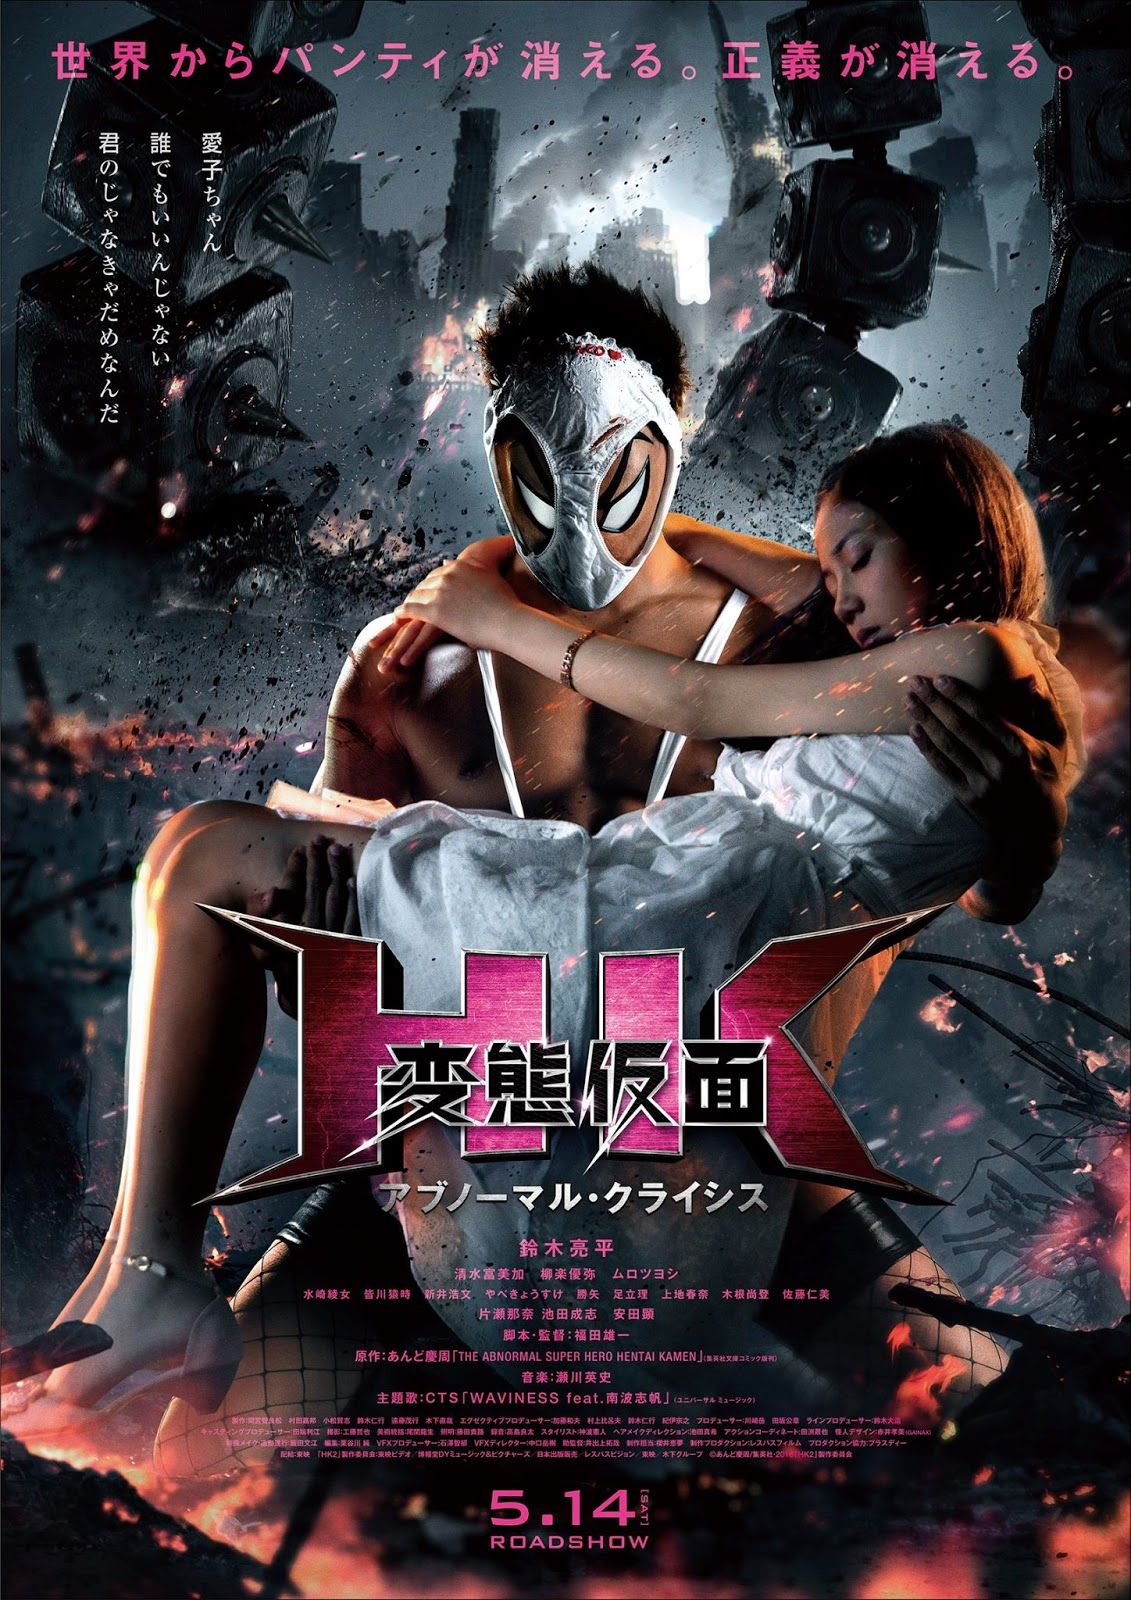 Cage Of Eden Hentai Cool undies take flight in the new hentai kamen: the abnormal crisis